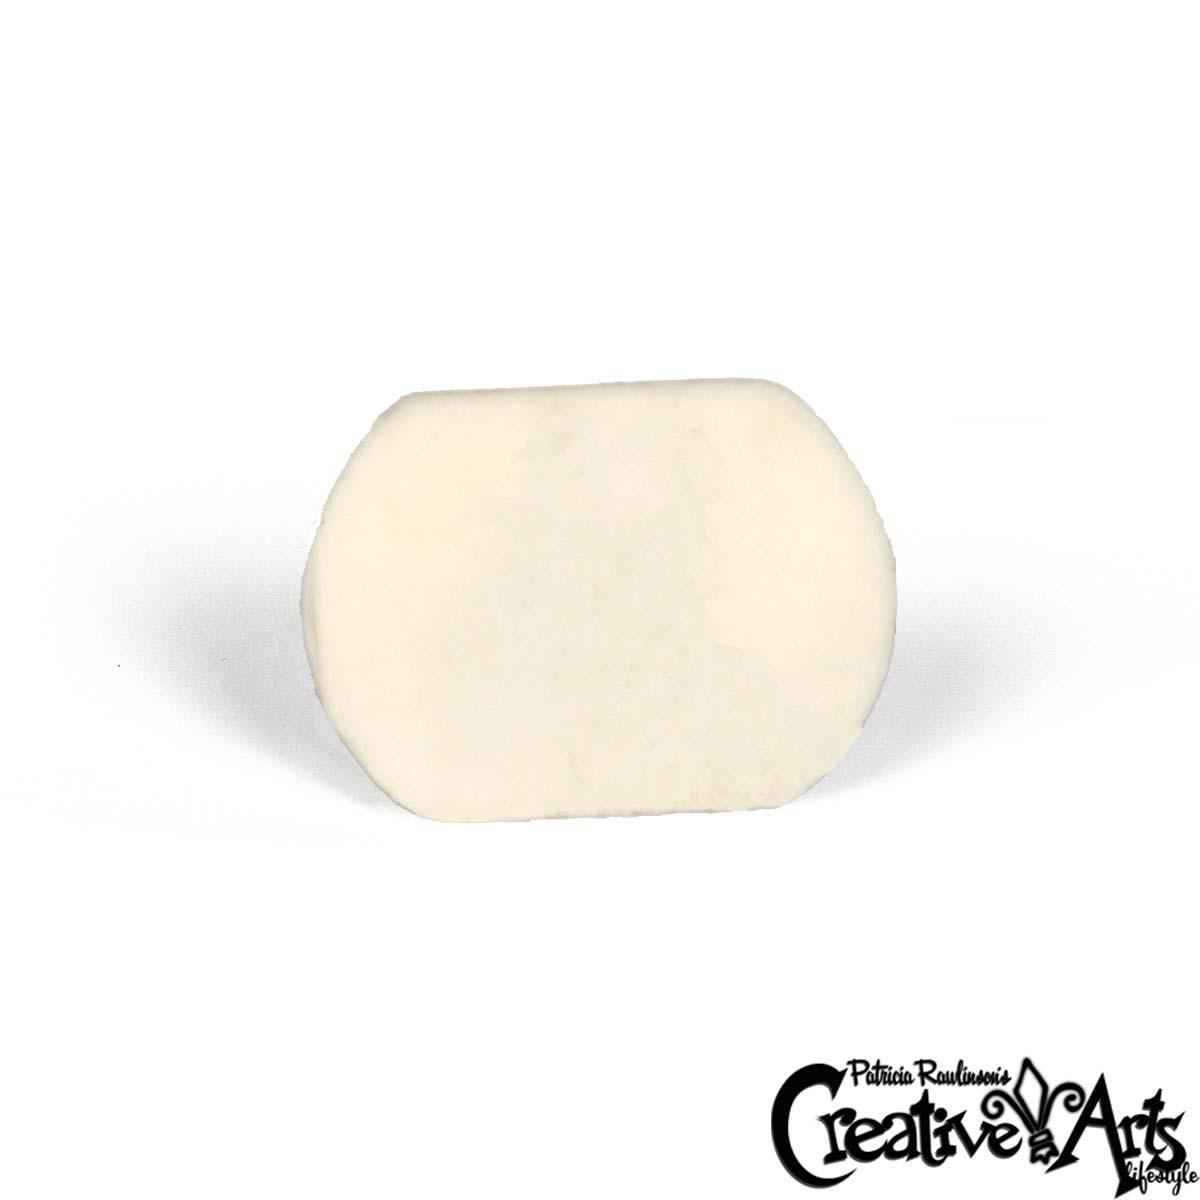 280/400 Grit Sanding Disc - Fine & Extra Fine | TOOL136